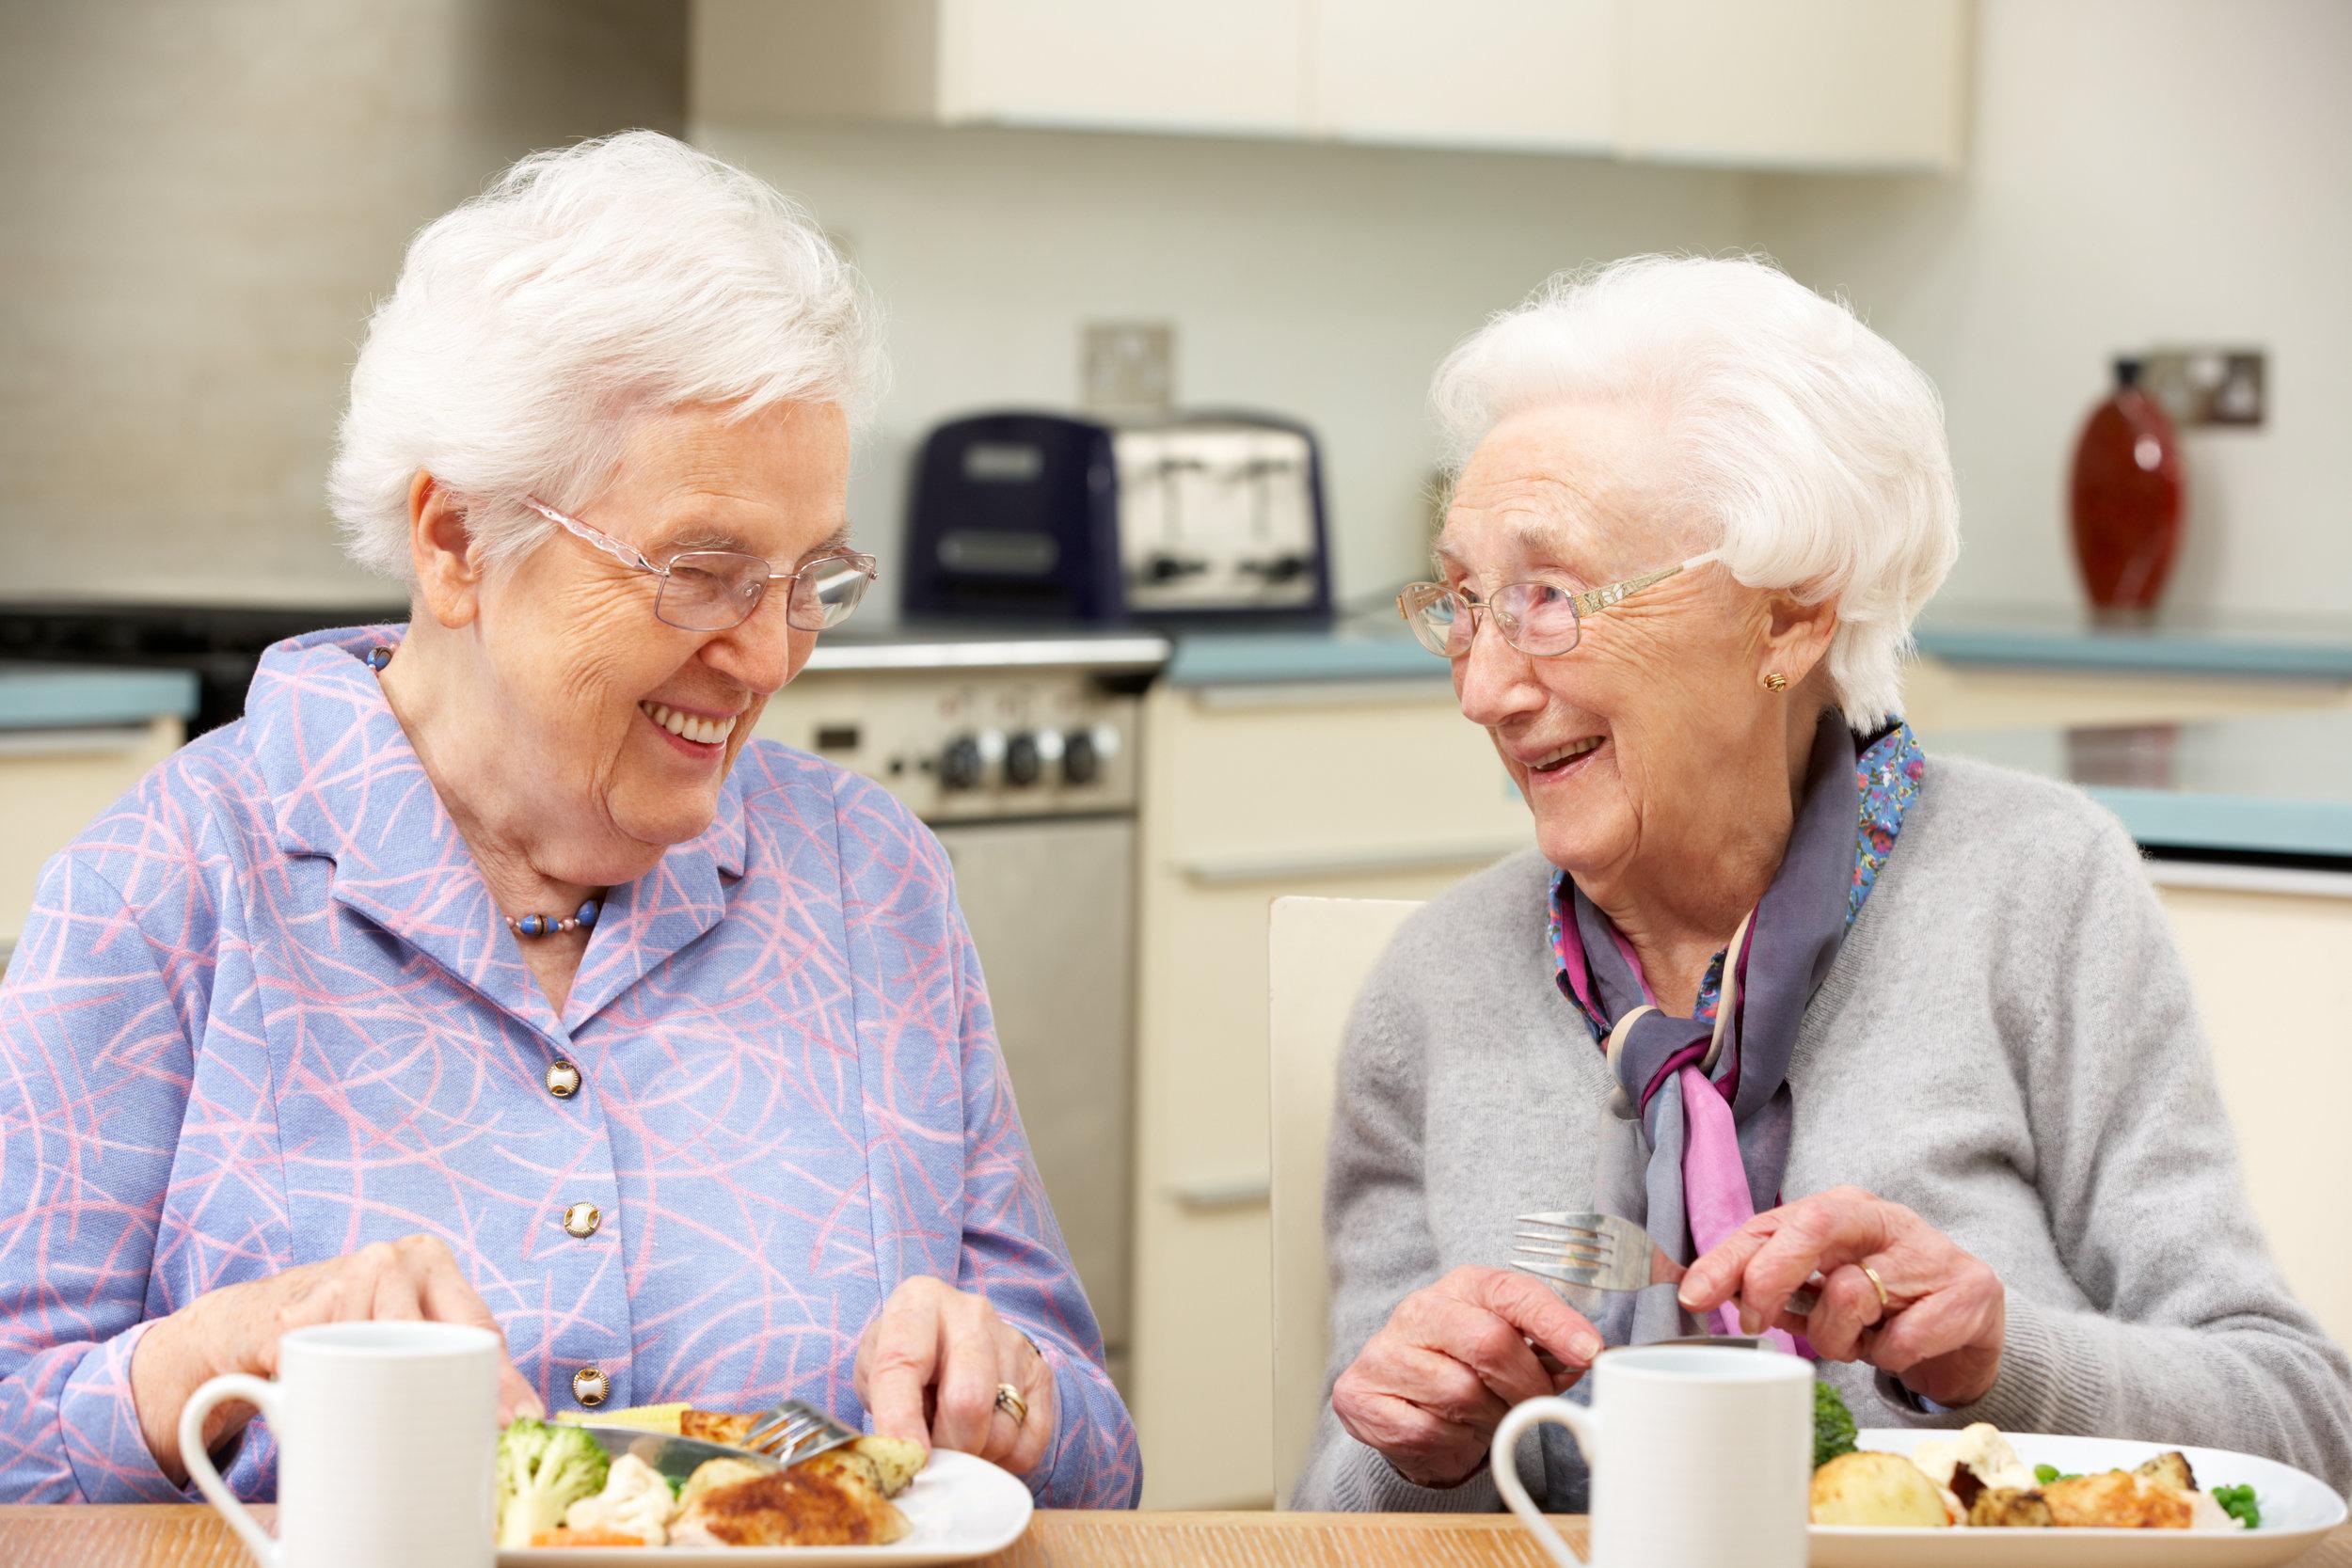 2 elderly ladies having tea and cake